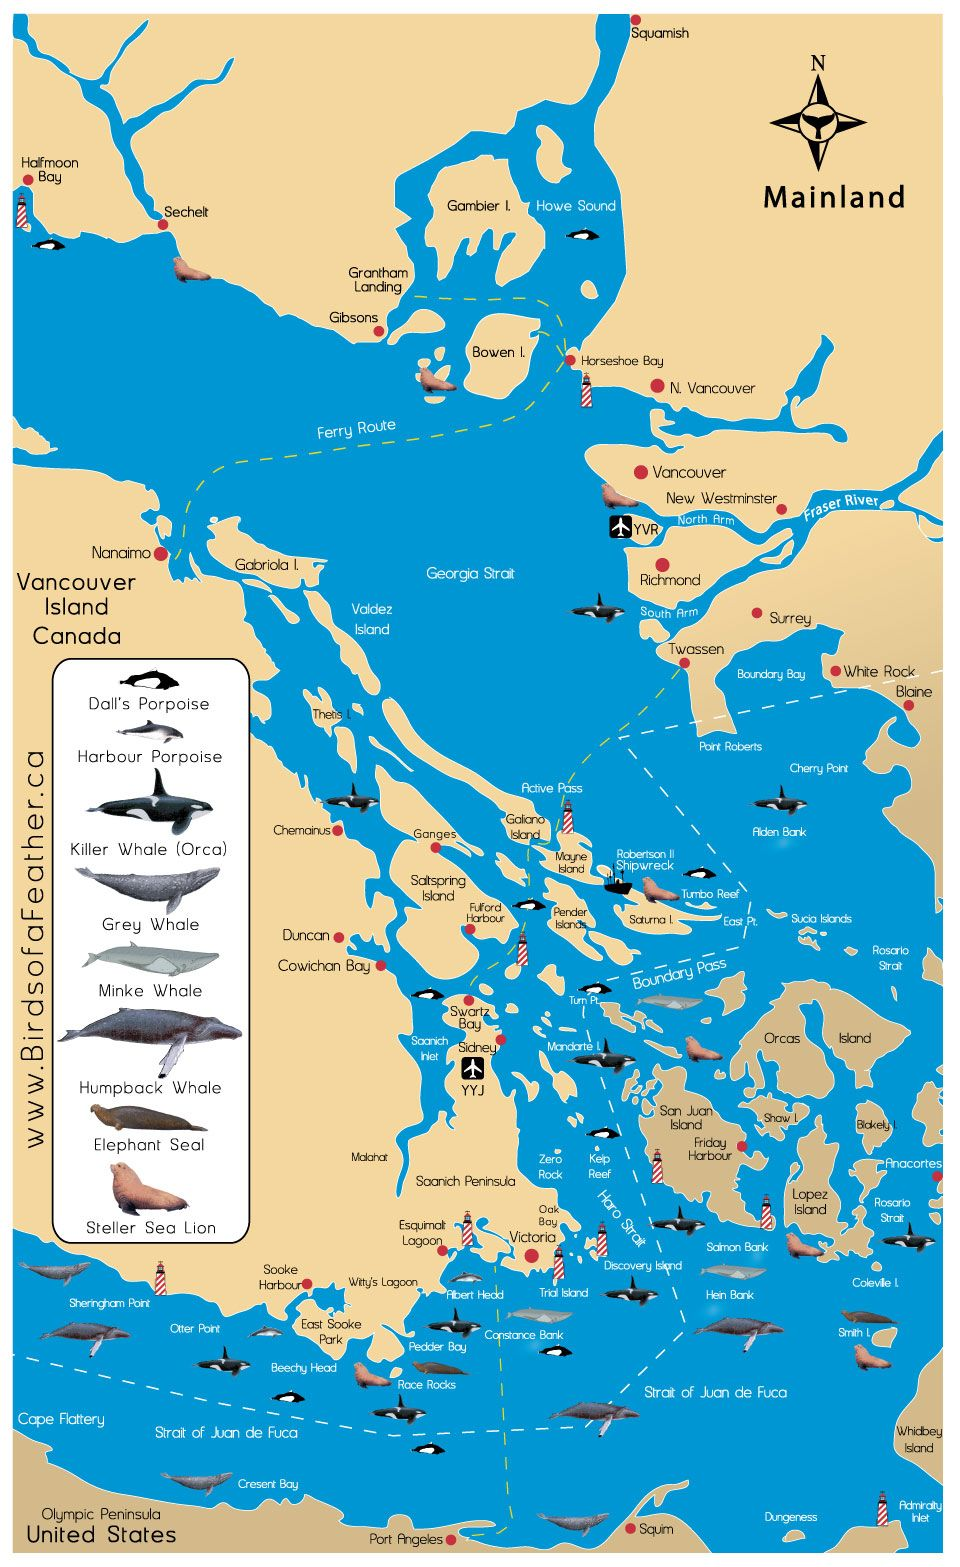 San Juan Islands Ferry Map San Juan Islands map w/ cetacean ranges. Ferry riders has the